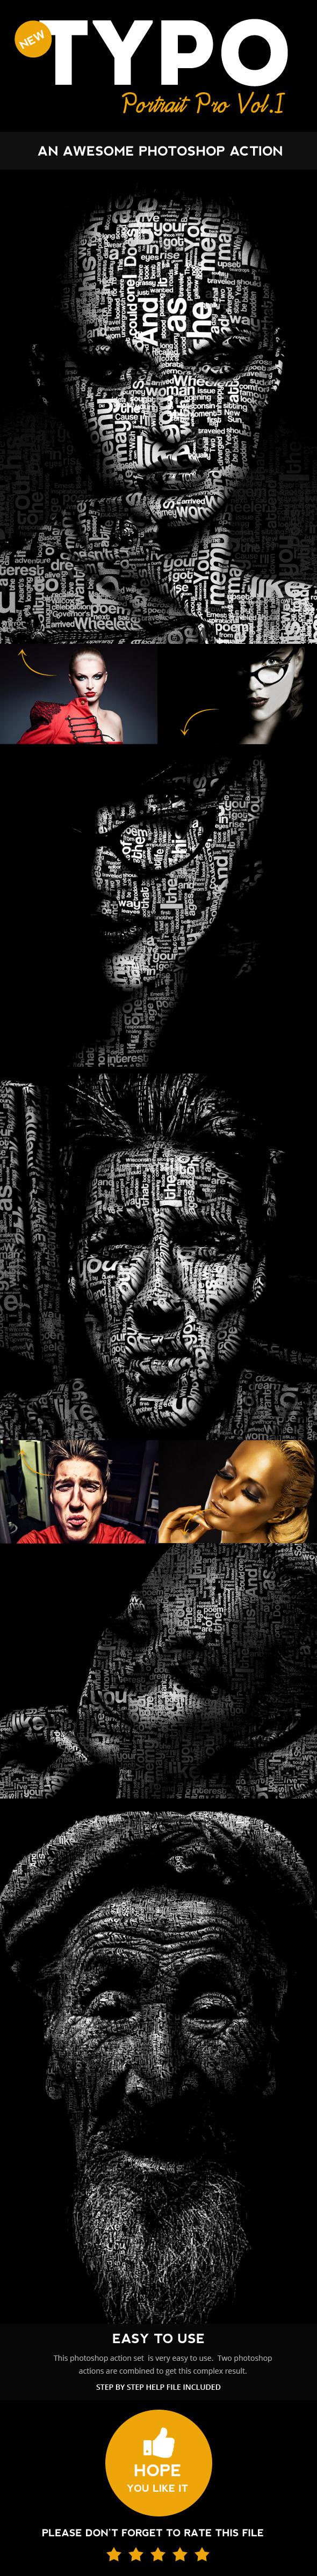 GraphicRiver Typo Portrait Pro Photoshop Action 10777433